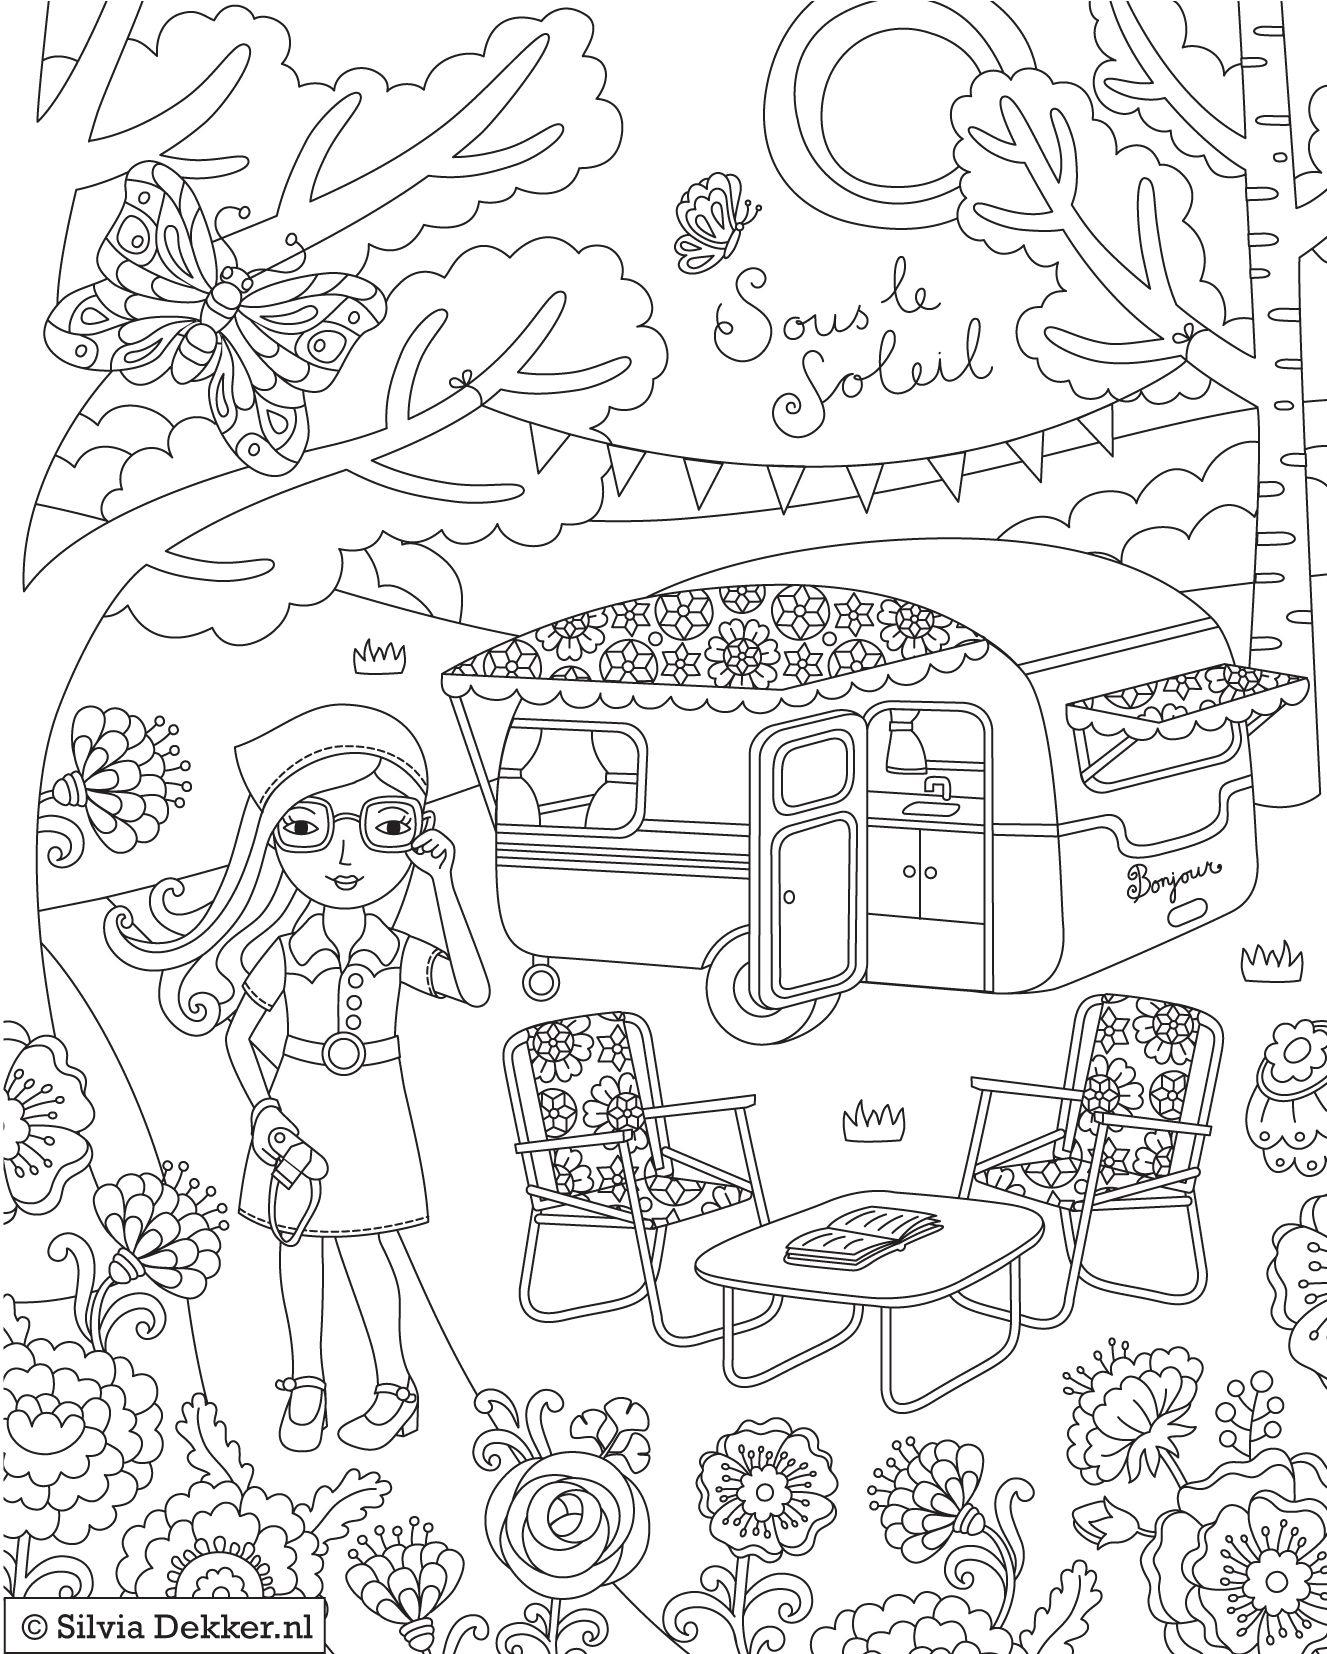 Pin By Silvia Dekker On Silvia Dekker Illustration Camping Coloring Pages Coloring Pages Coloring Pages To Print